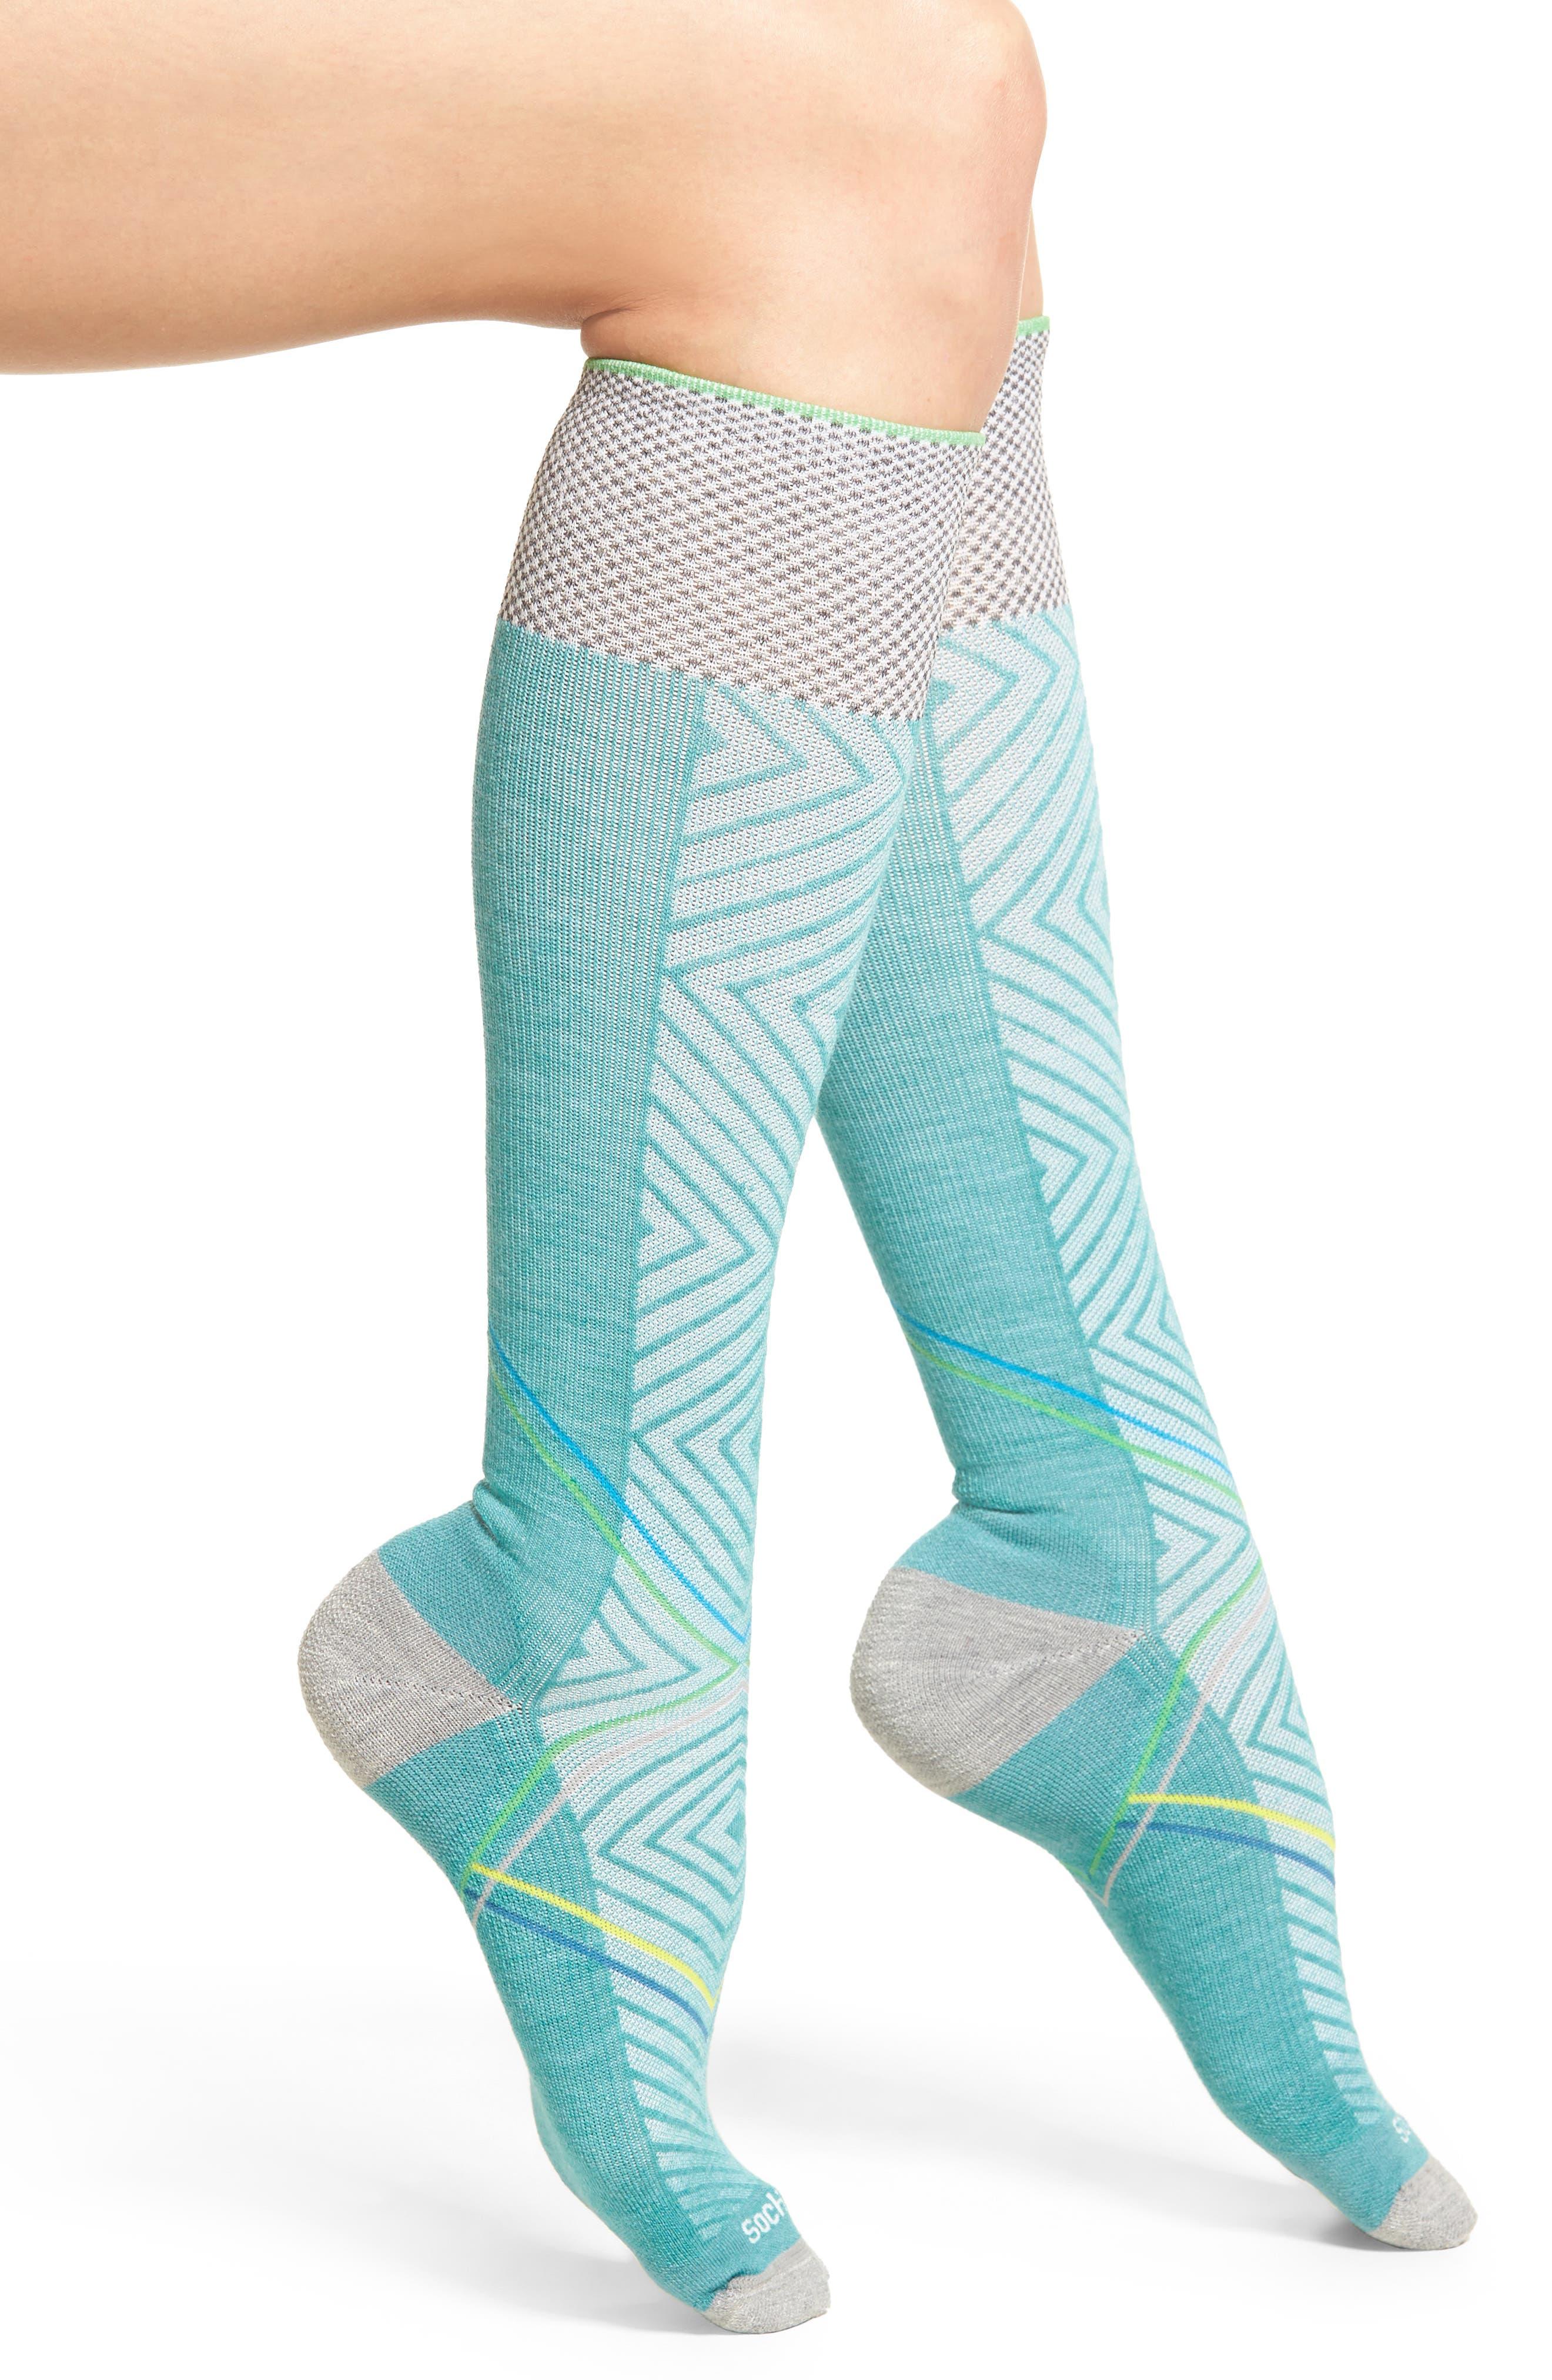 Alternate Image 1 Selected - Sockwell Pulse Compression Knee Socks